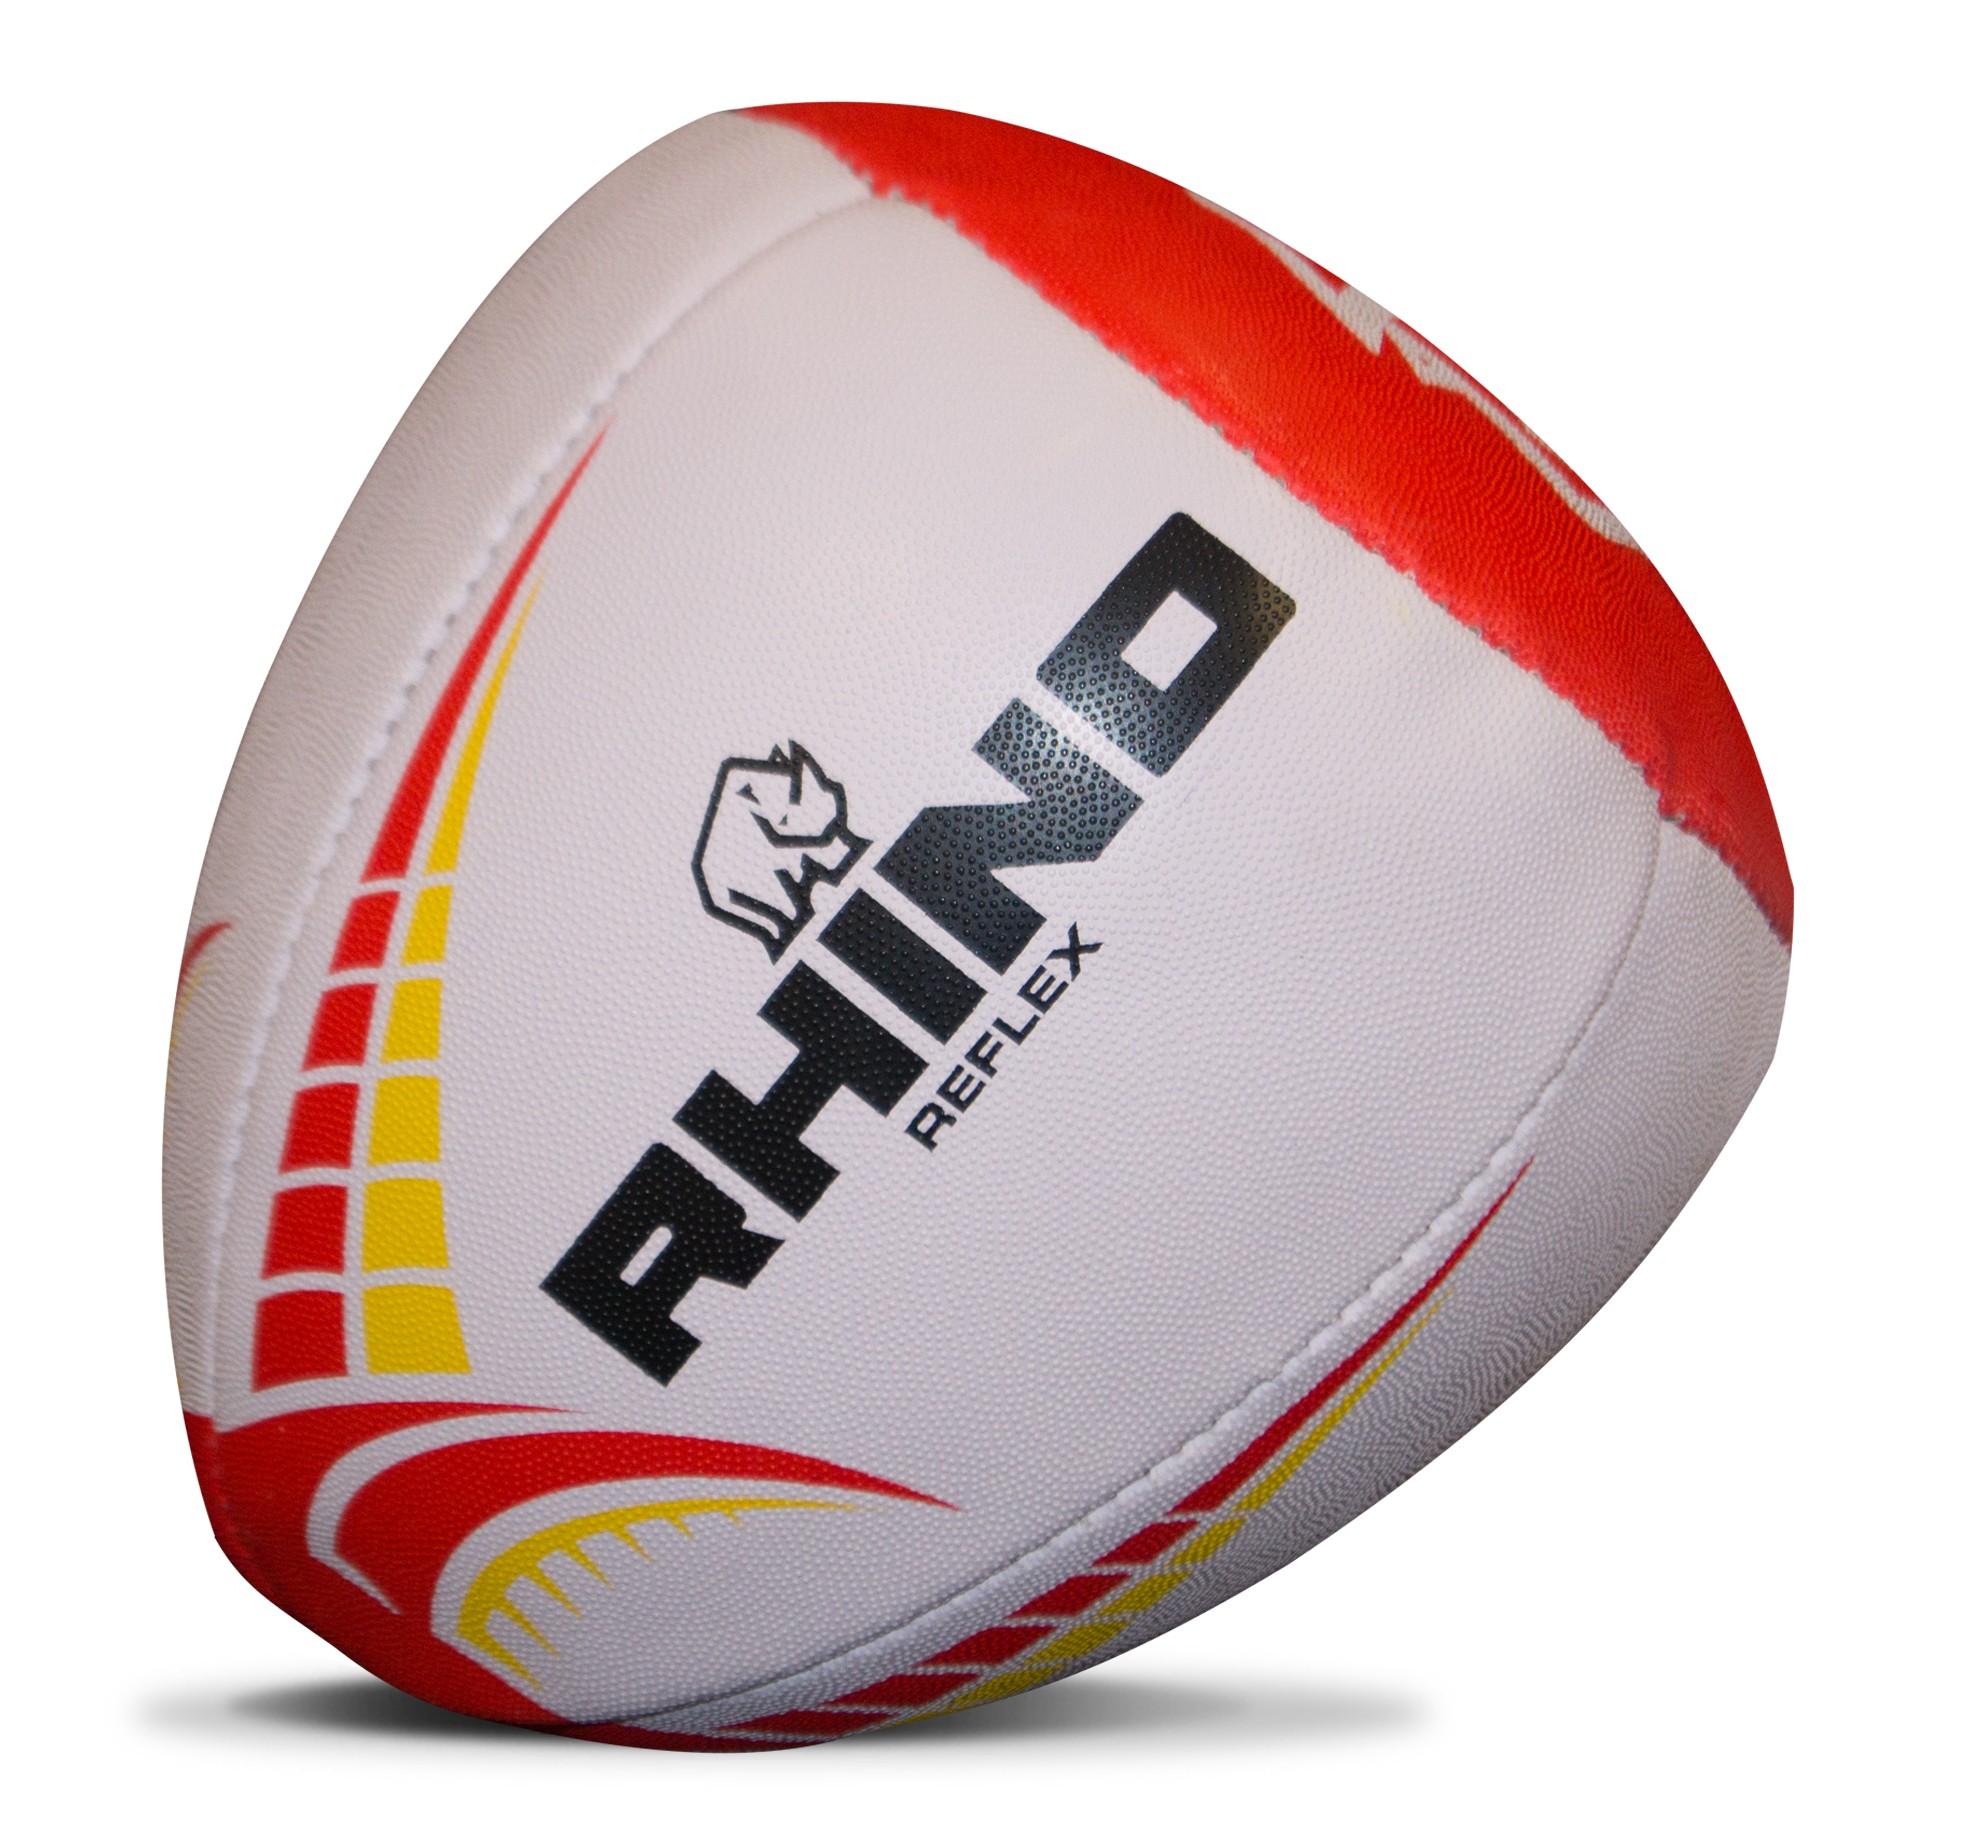 Reflex Practice Rugby Ball | Buy Online